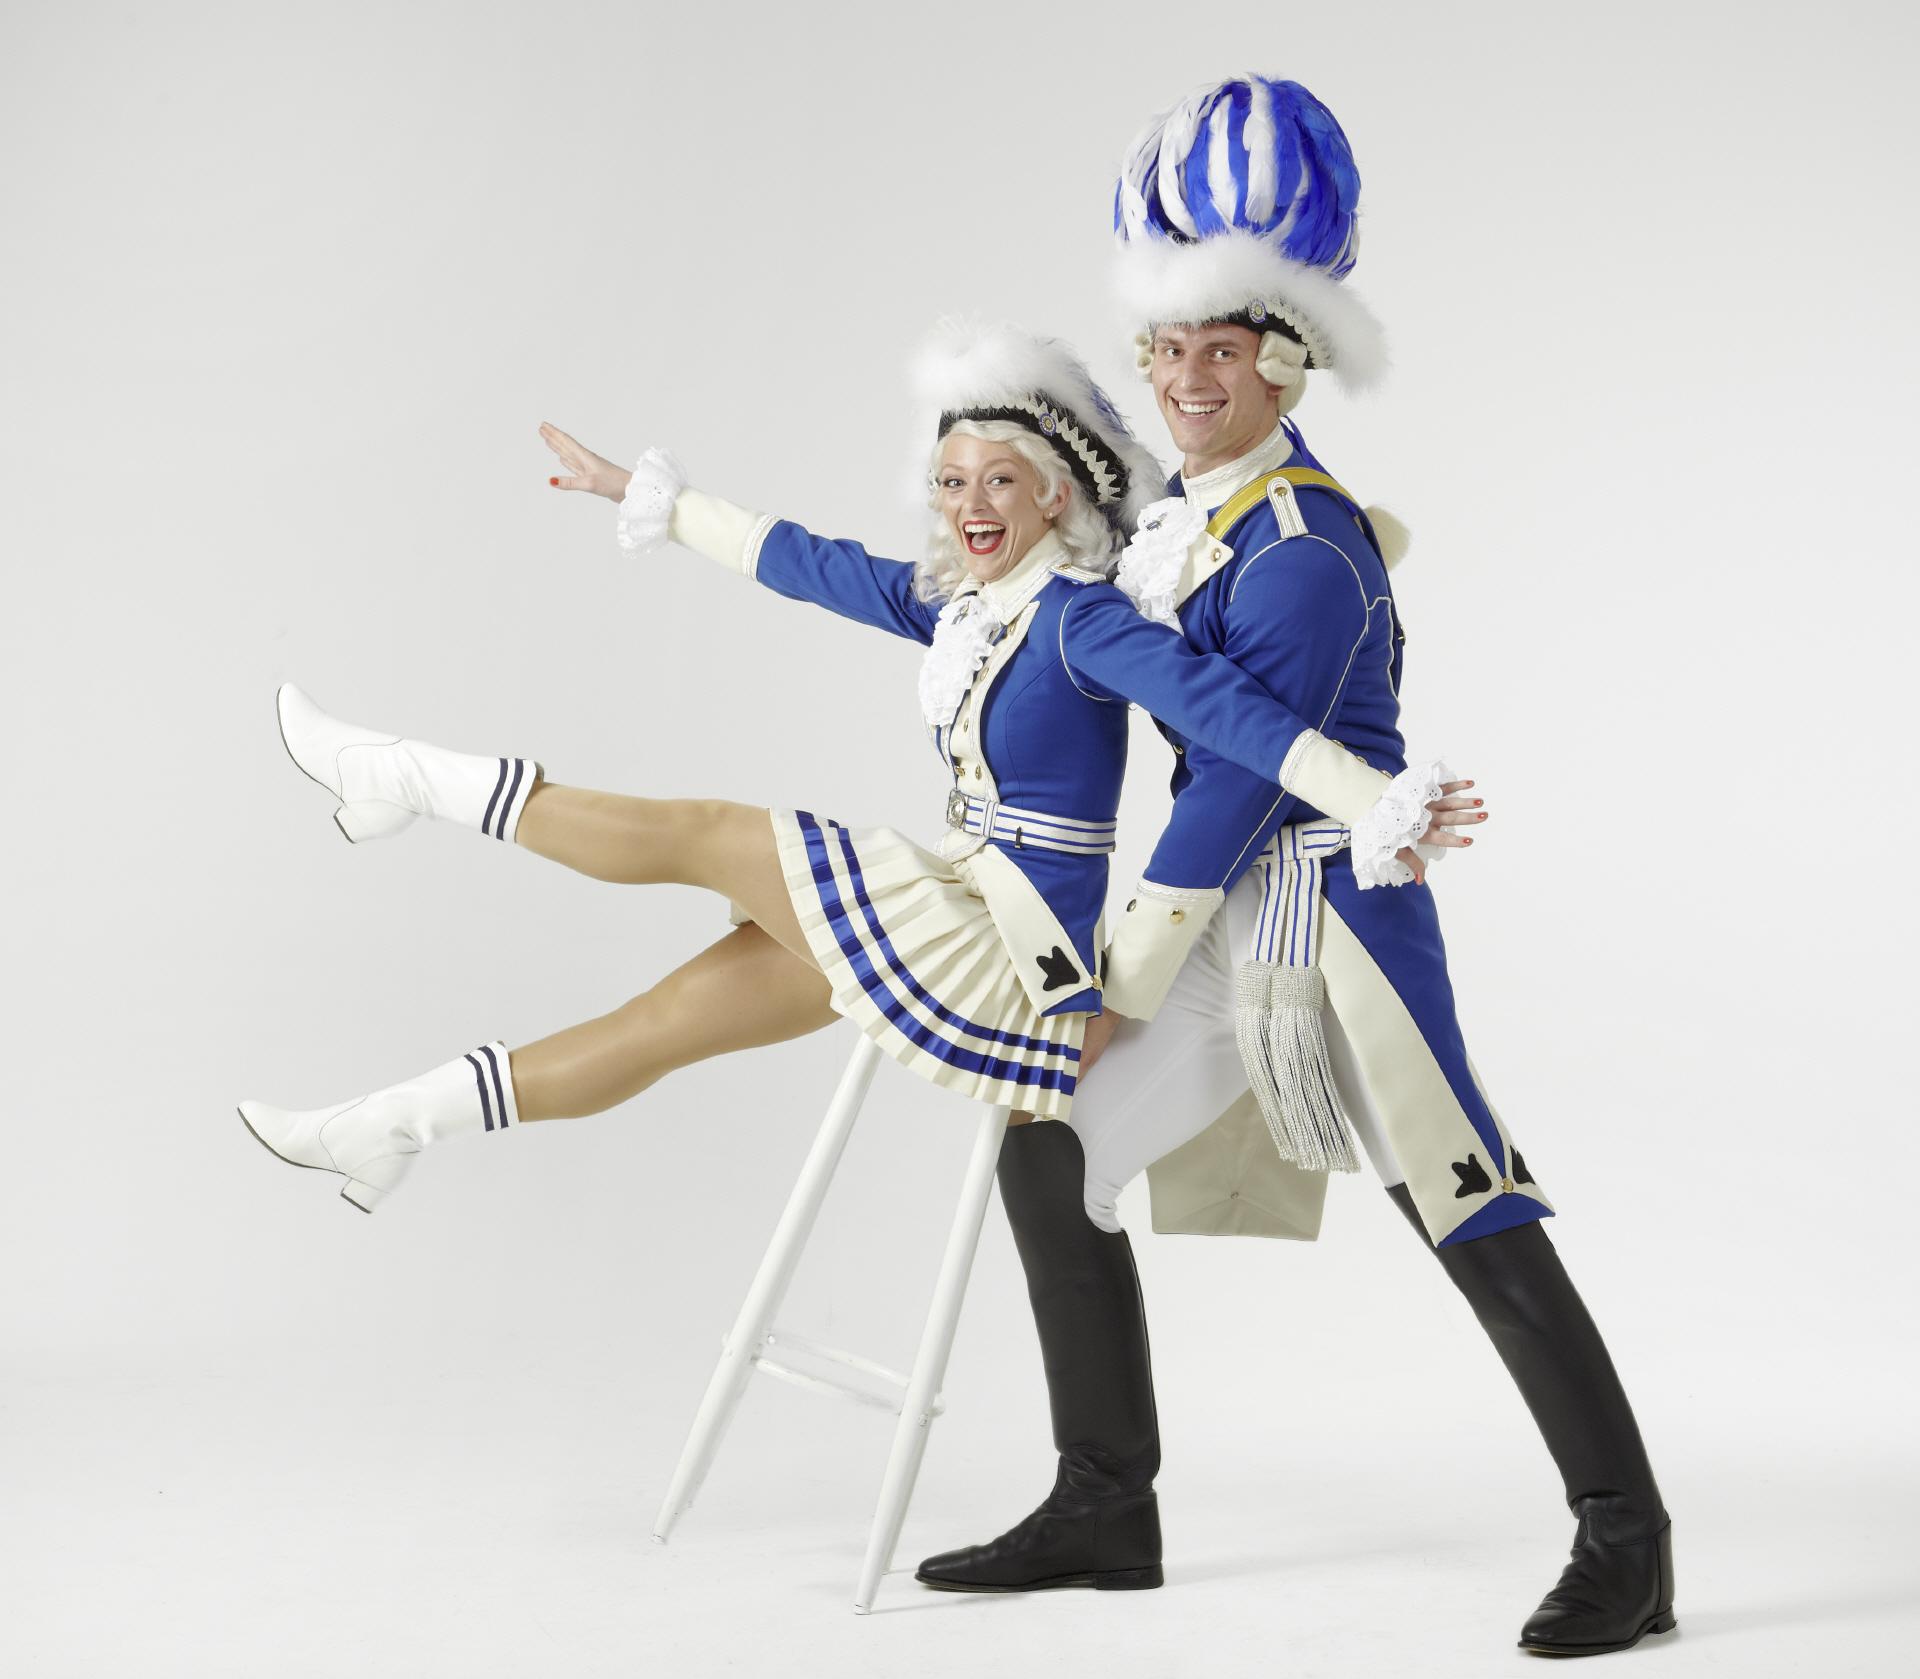 Tanzpaar Blaue Funken